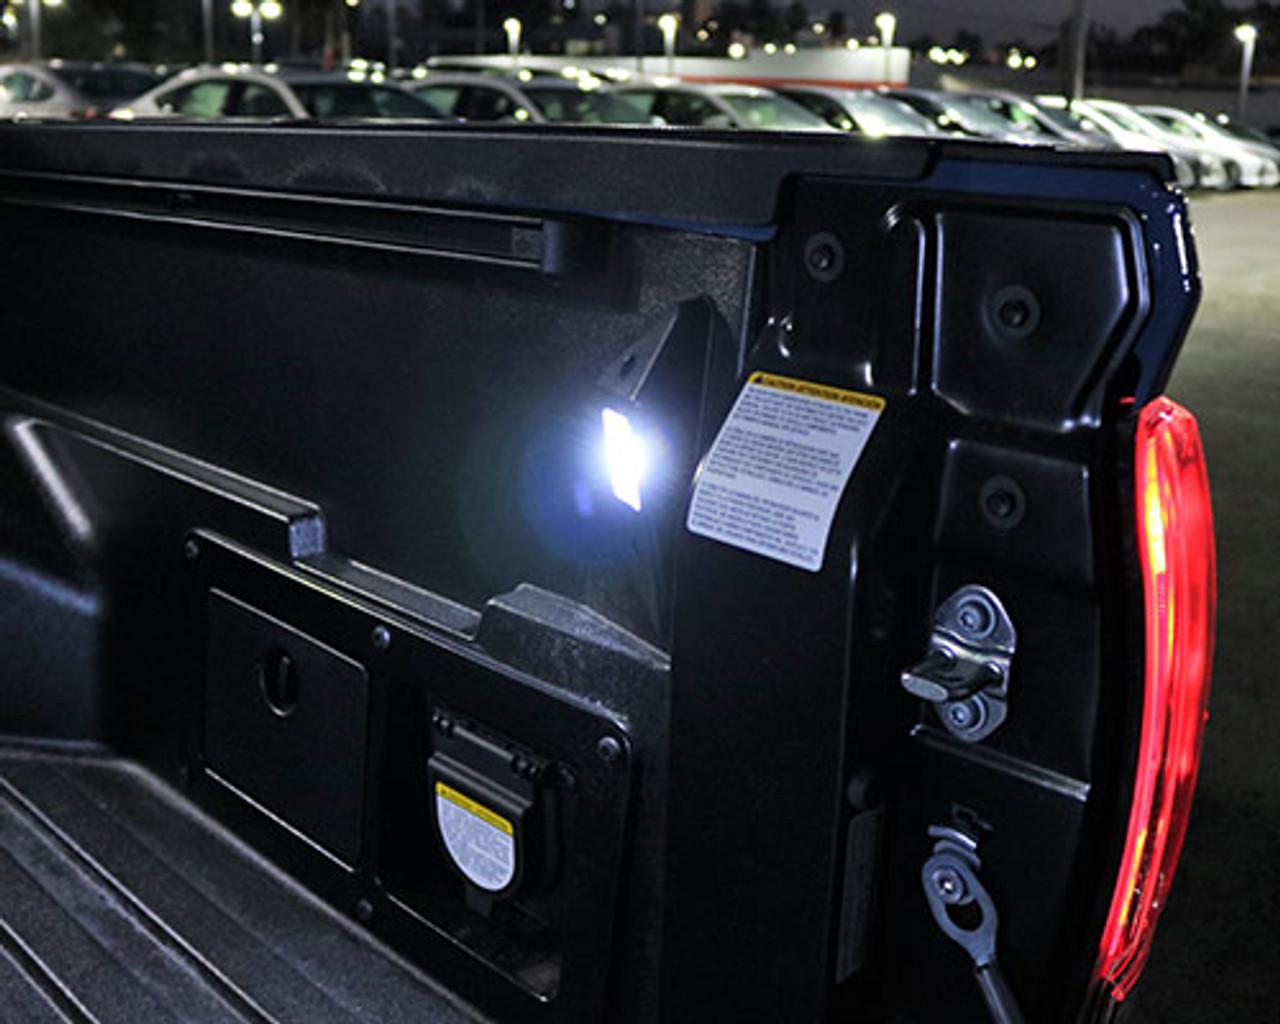 2018 Tacoma Bed Led Lighting Kit